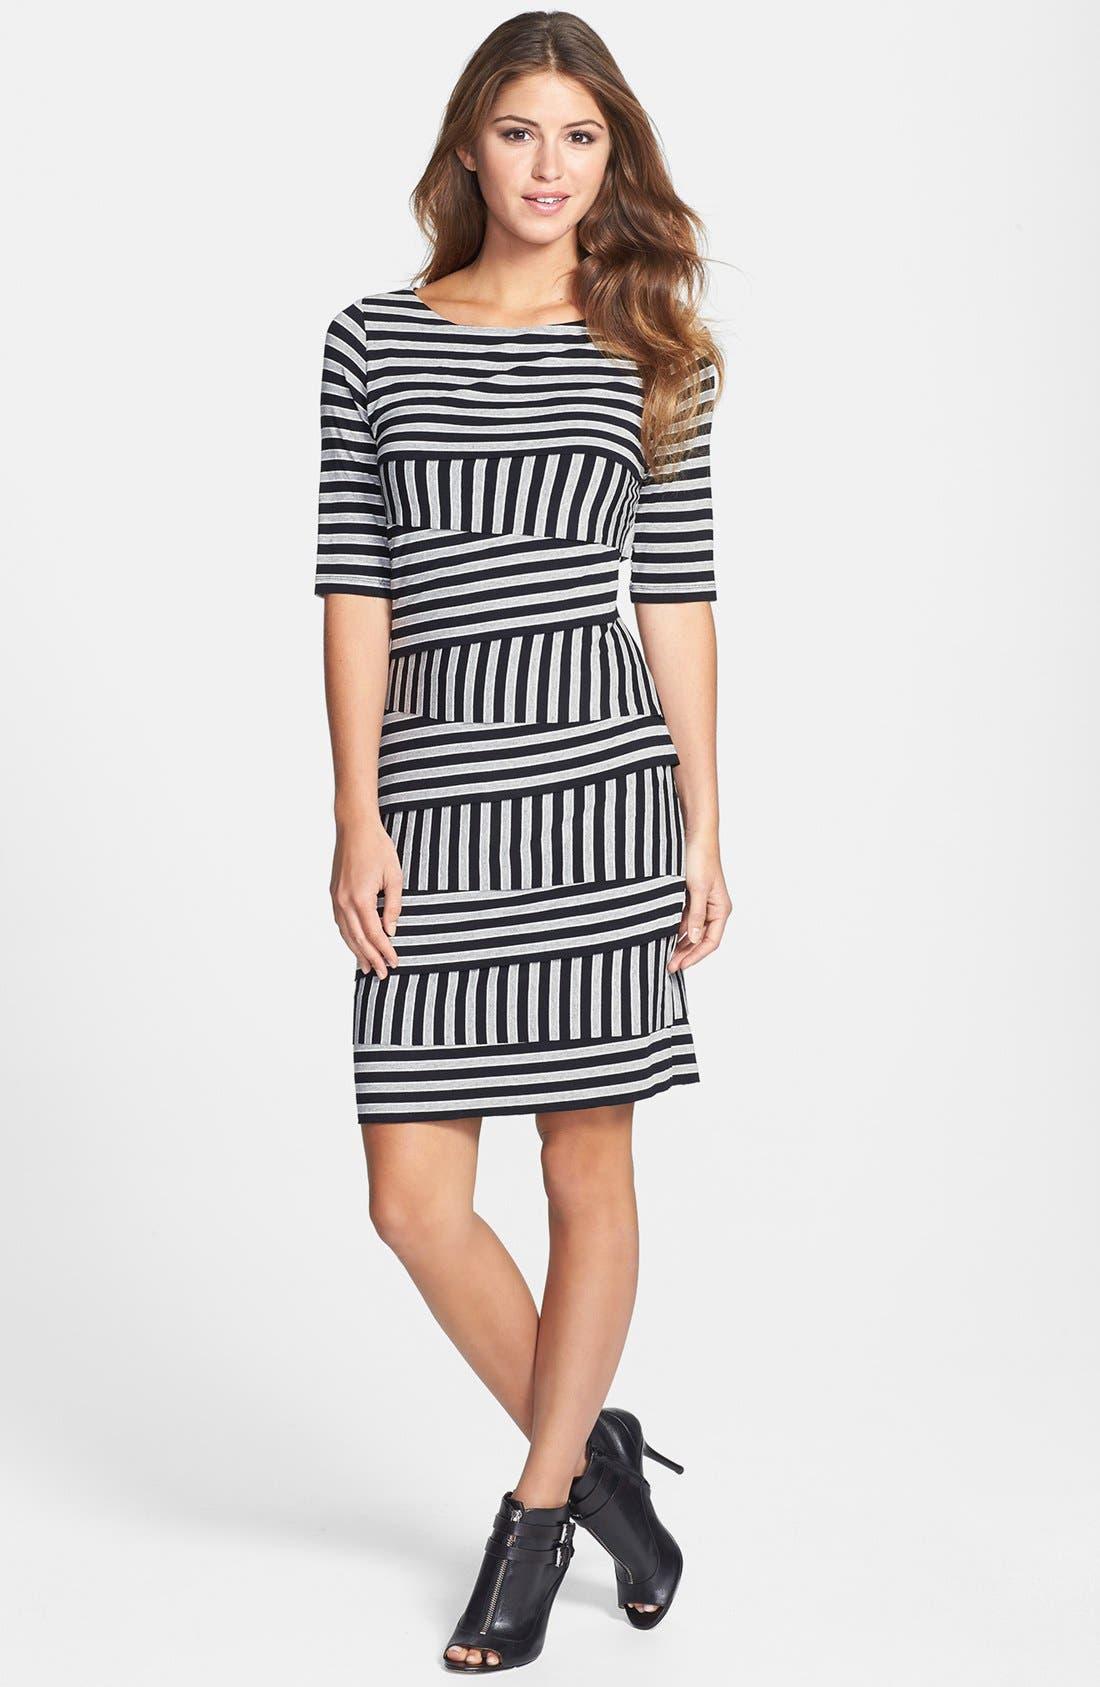 Alternate Image 1 Selected - Vince Camuto 'Calais' Zigzag Stripe Dress